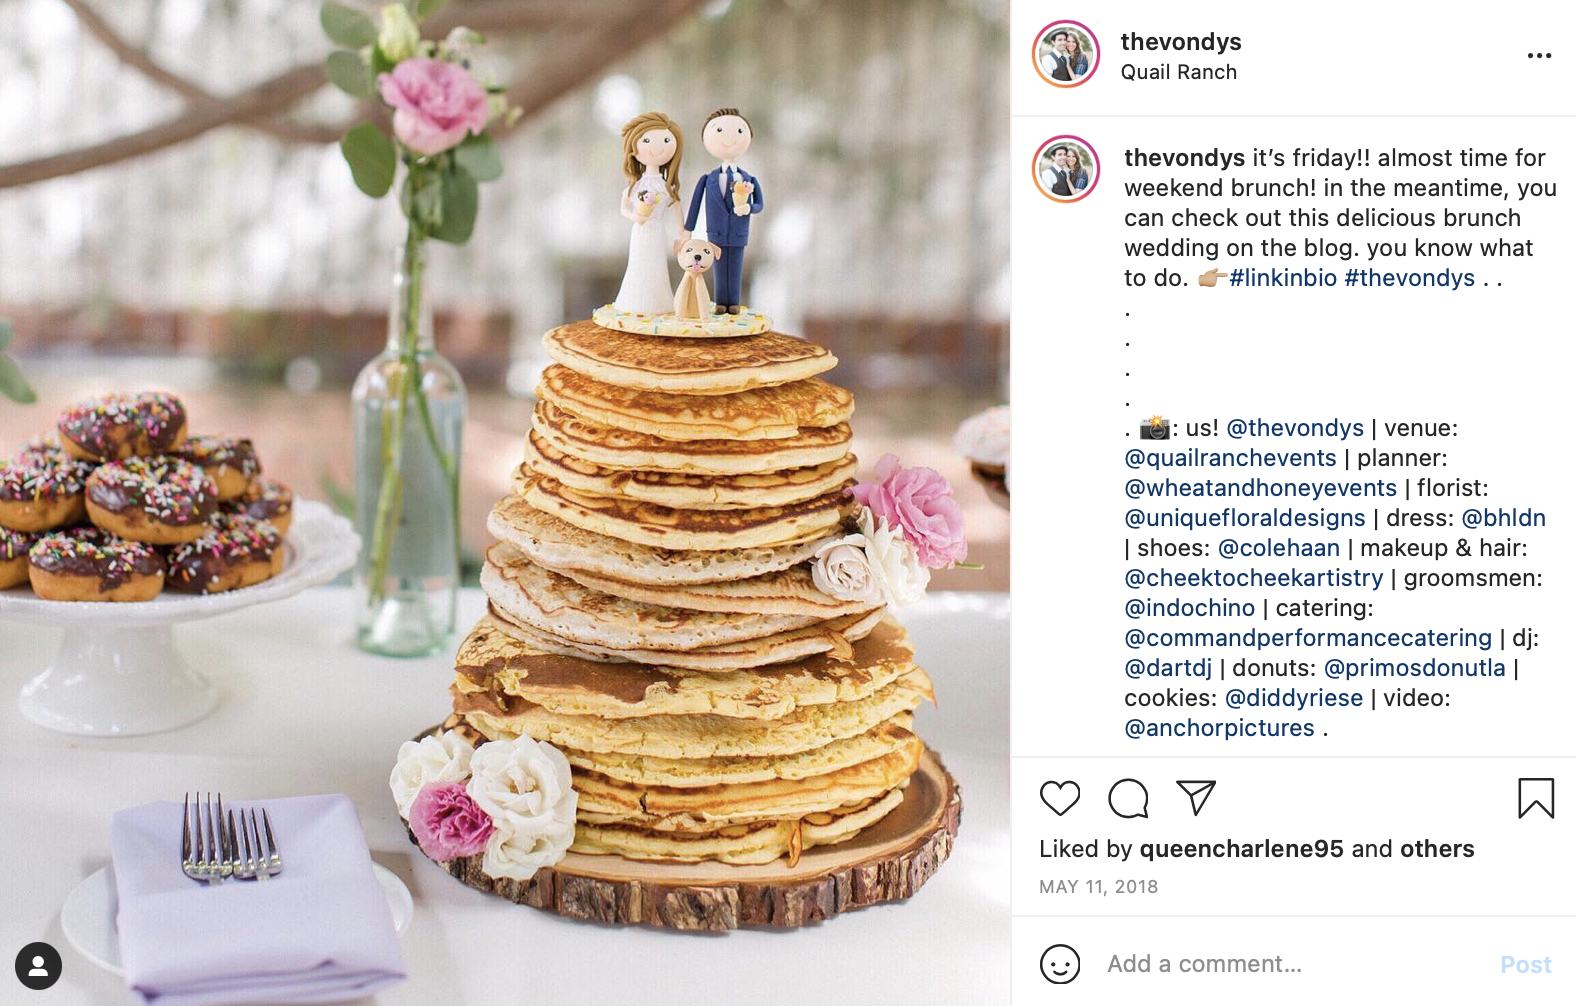 pancake cake for a brunch wedding reception